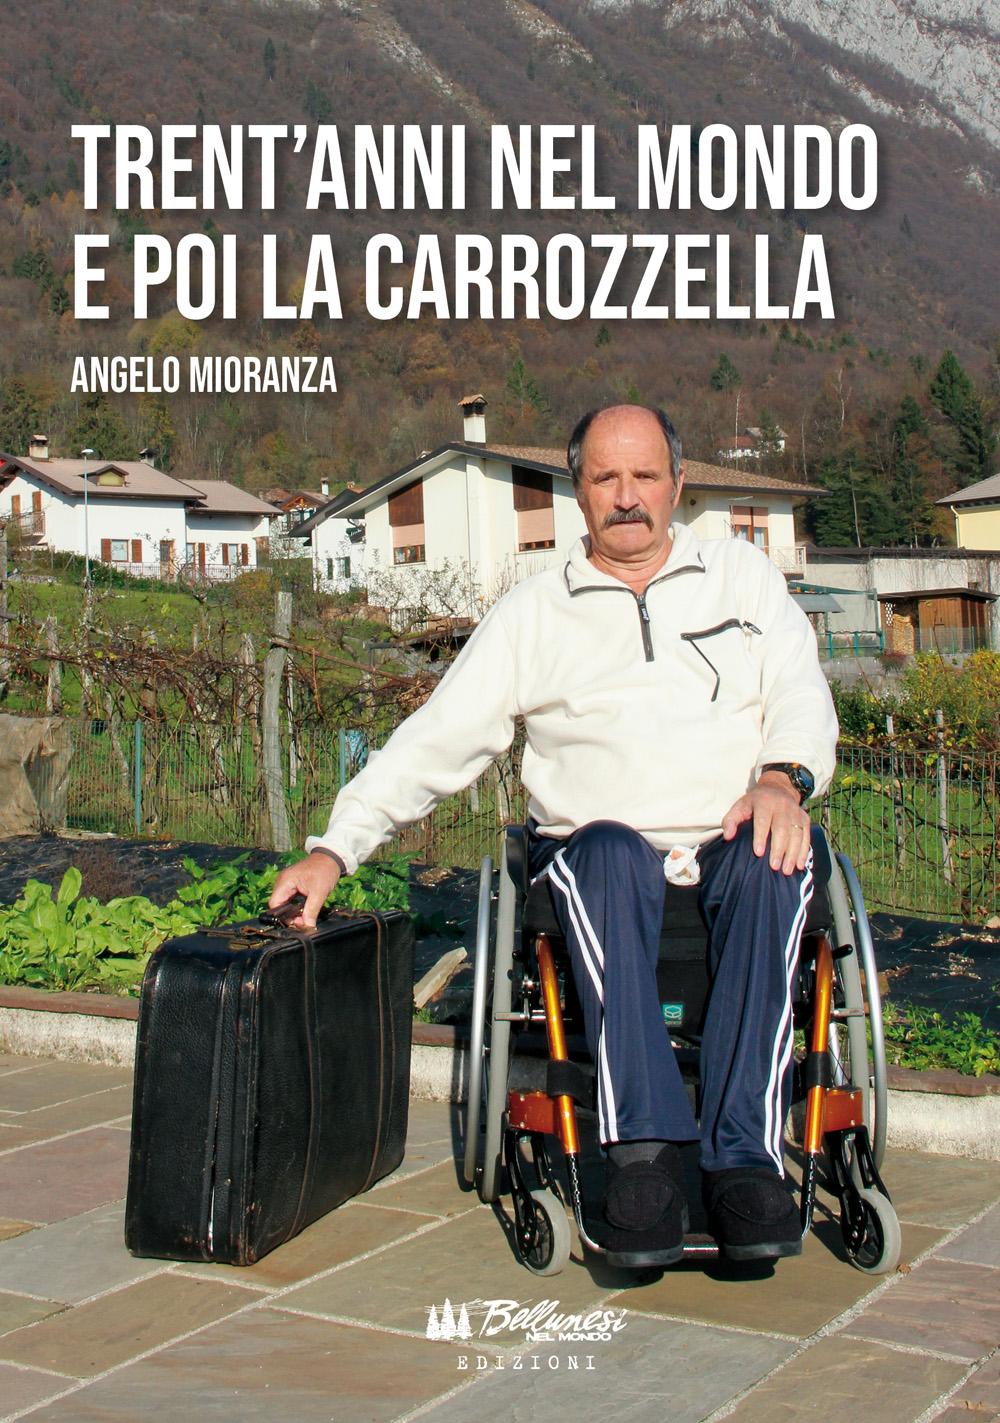 Angelo Mioranza